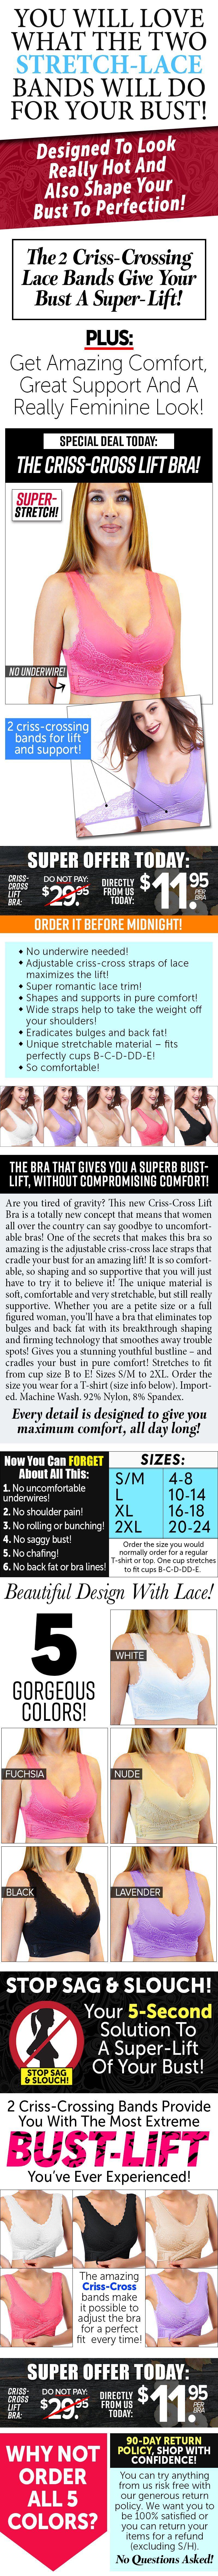 cfd4a8a23 Criss-Cross Lift Bra Deal – Primo Comfort